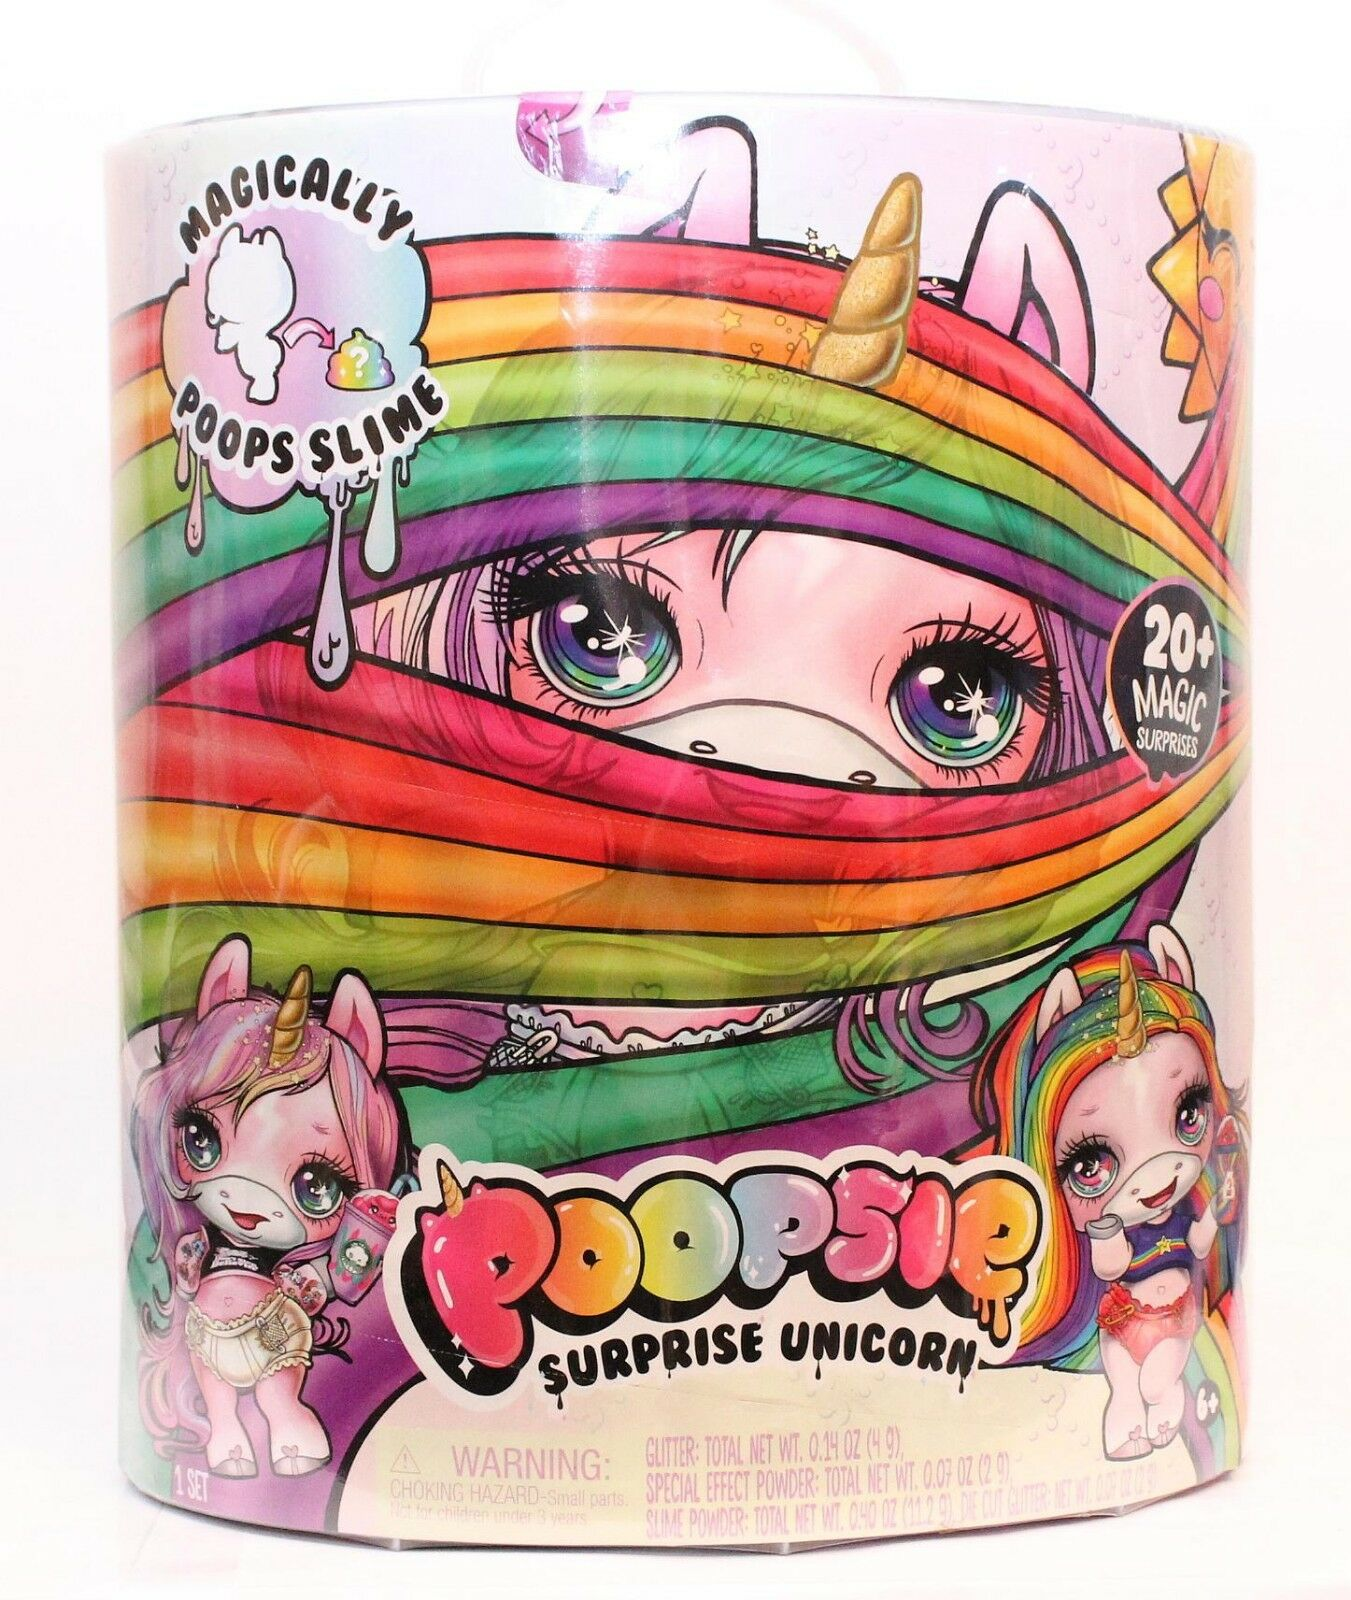 POOPSIE Slime Surprise Unicorn - 20+ Magic Surprises - New  - Poops - MGA Toys